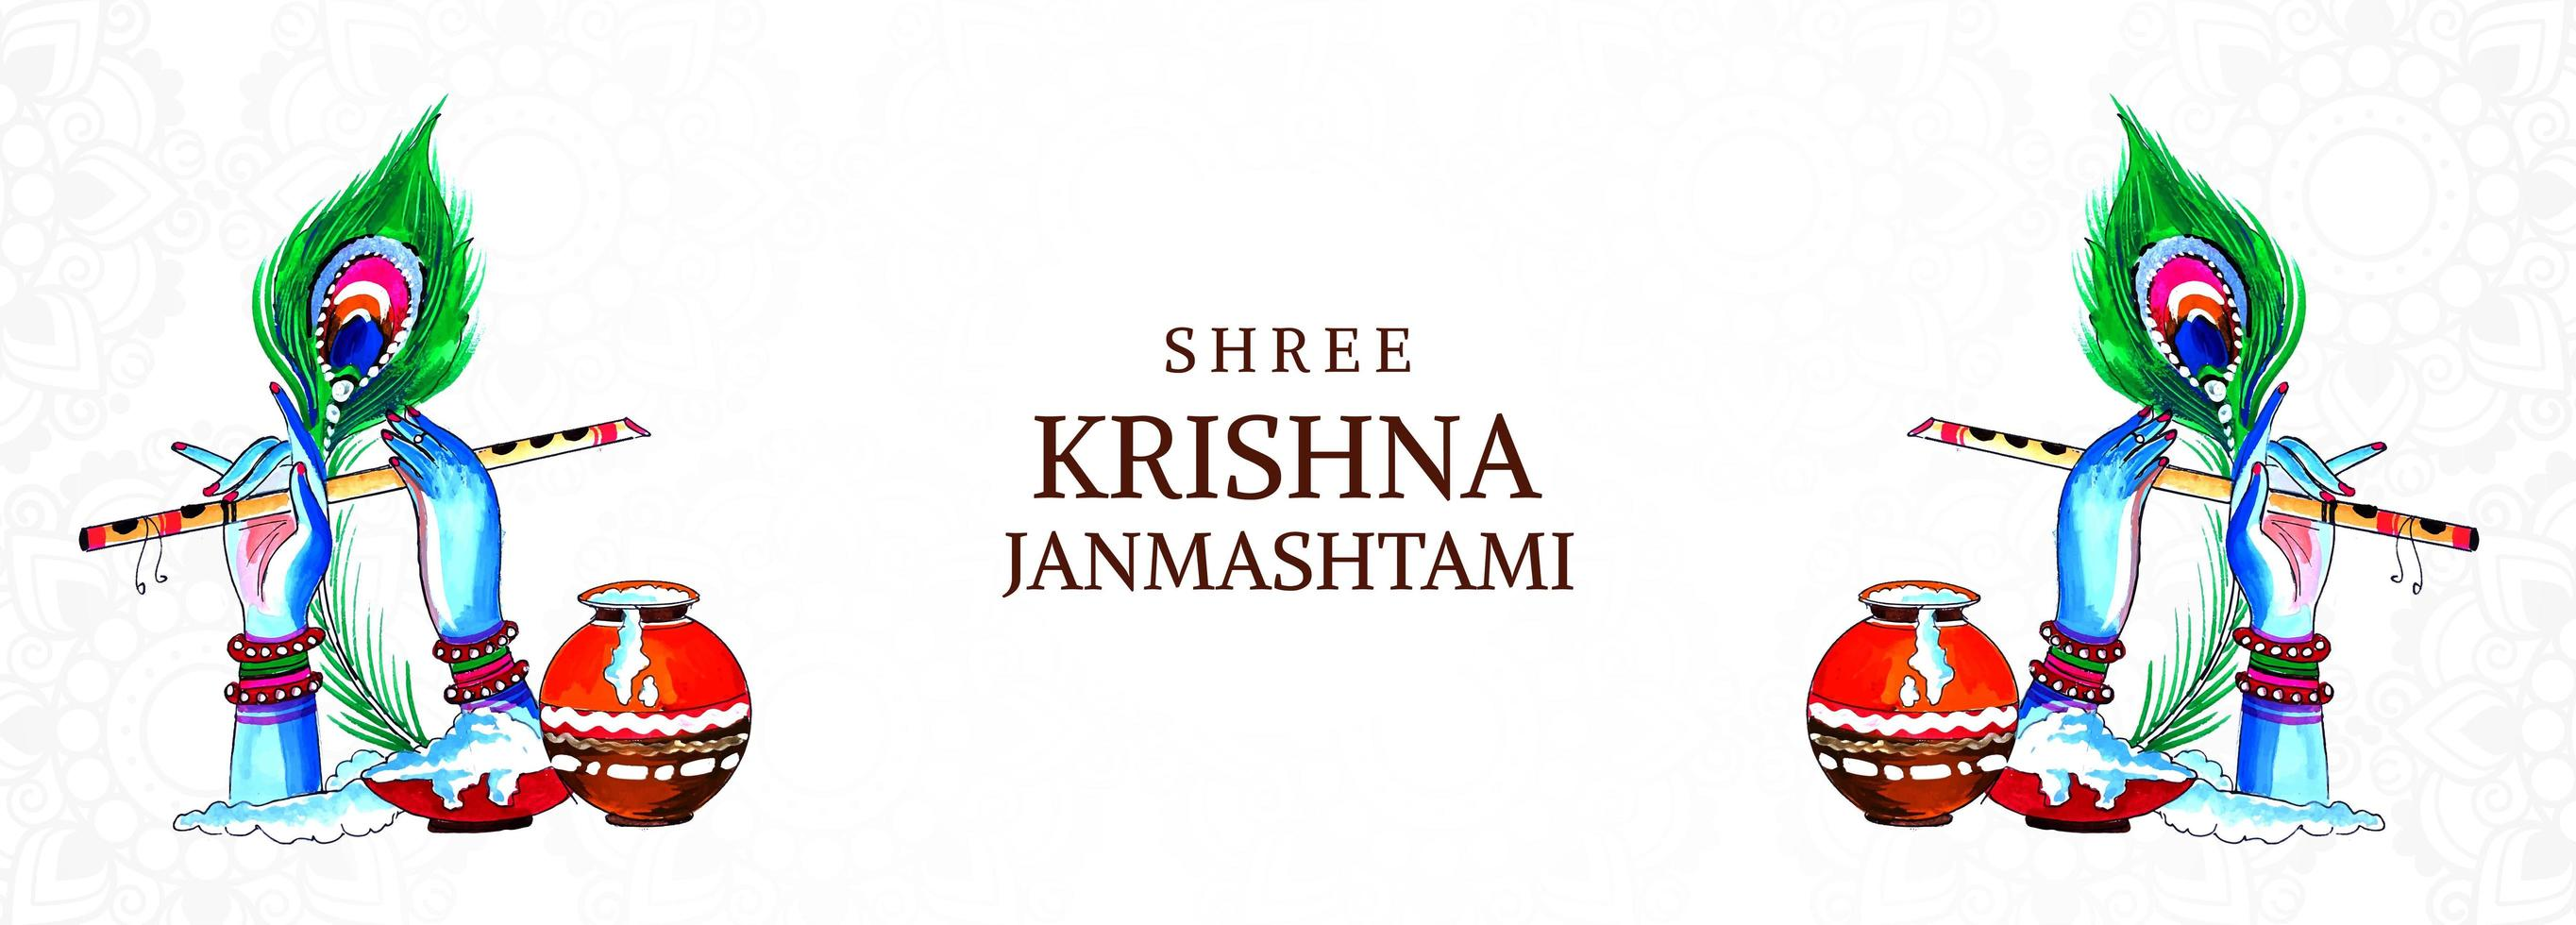 festival feliz krishna janmashtami manos y banner de flauta vector